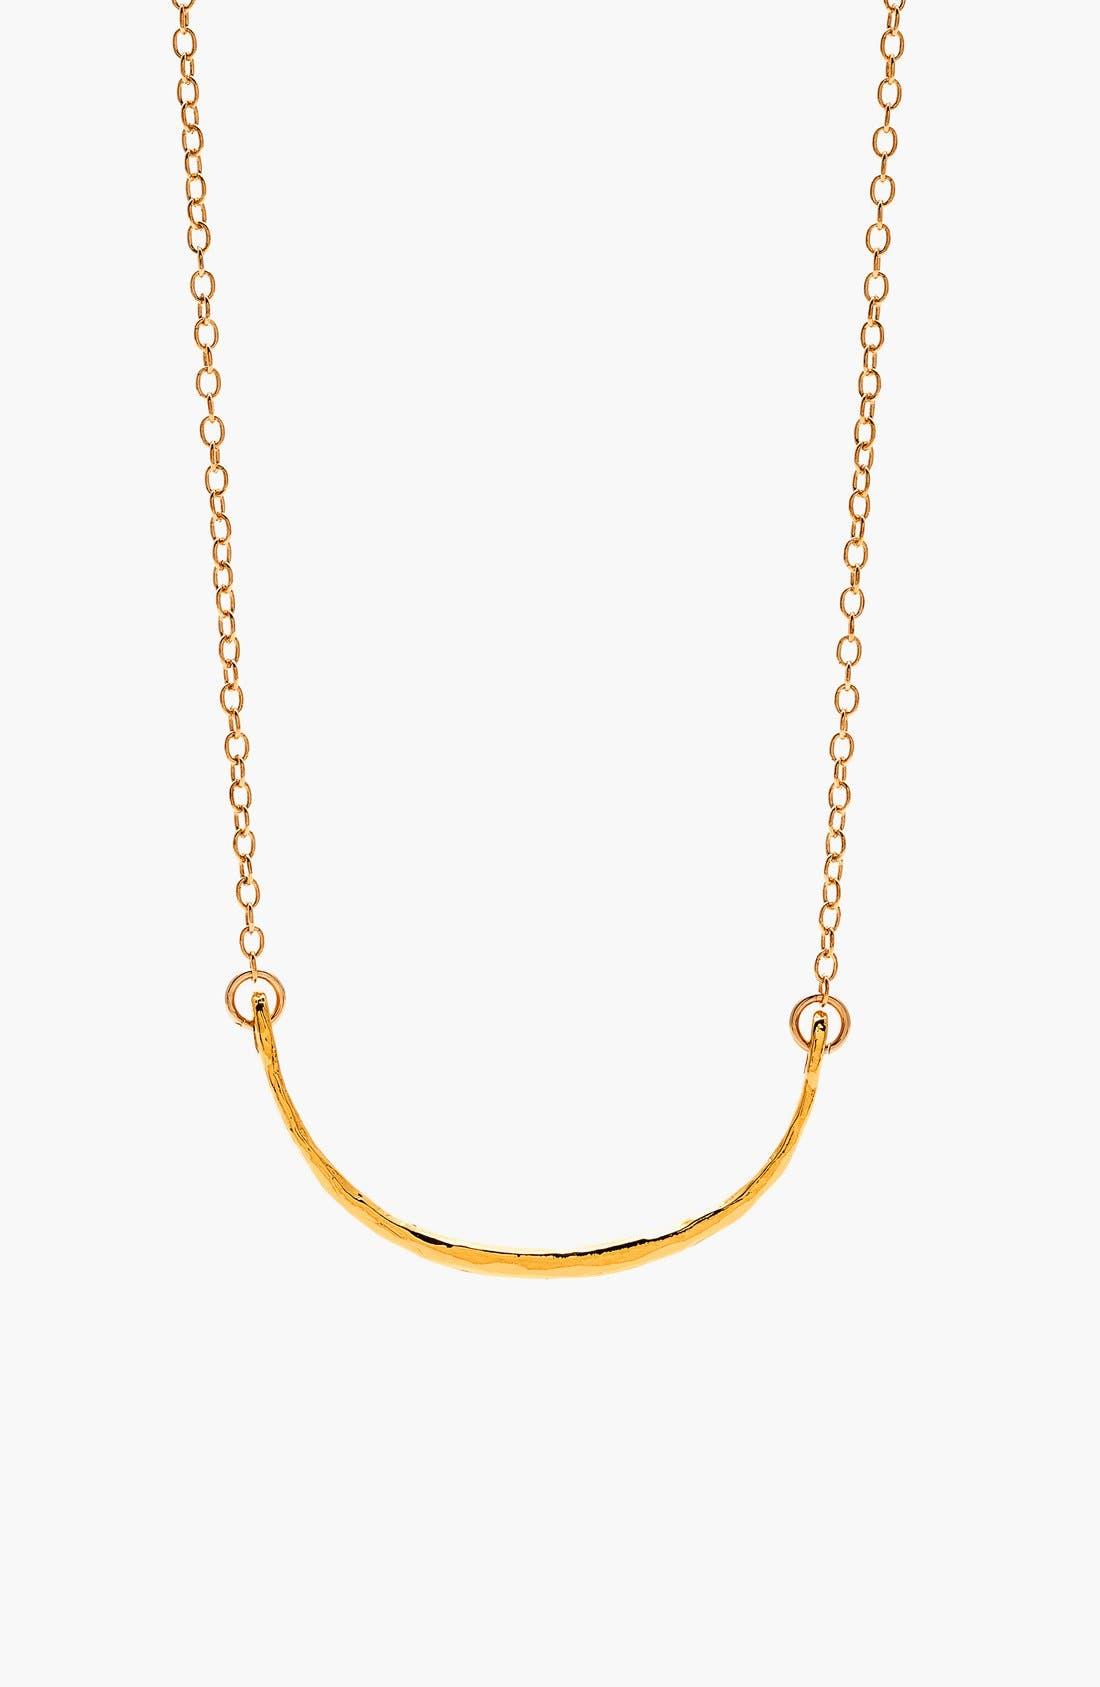 Main Image - gorjana 'Taner' Curved Pendant Necklace